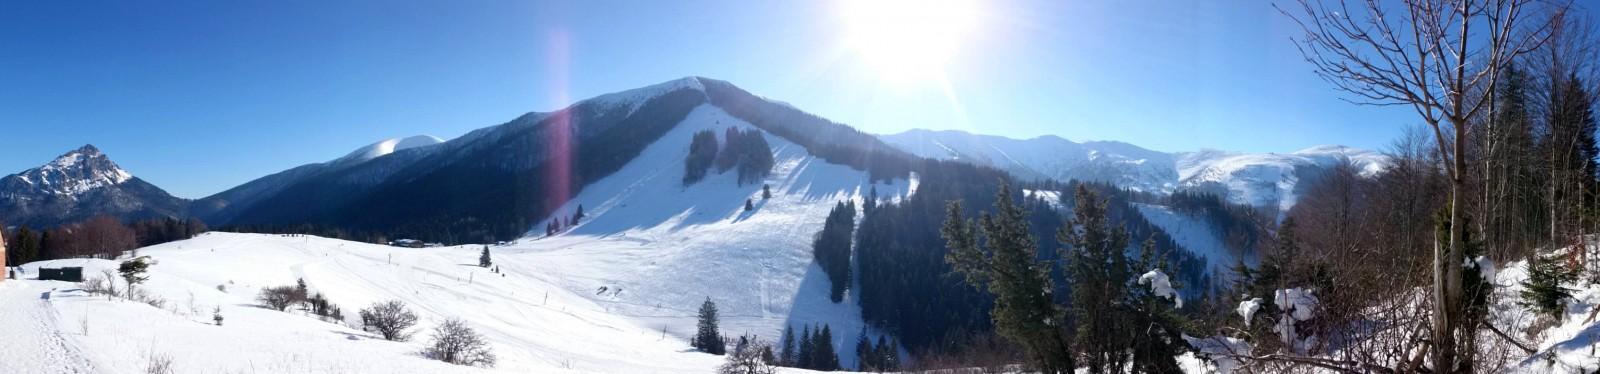 Ski areál Vrátná